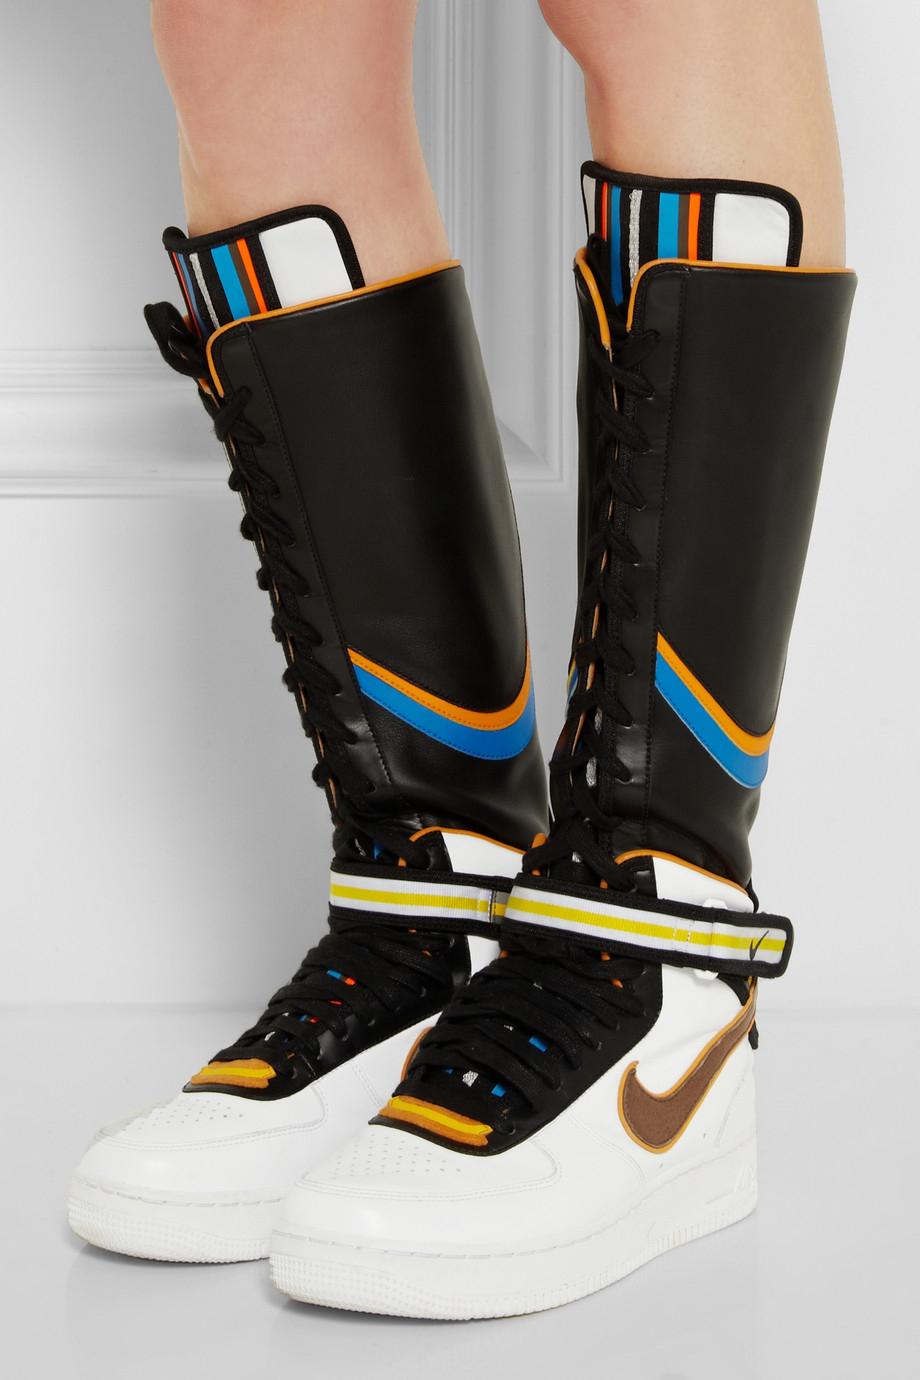 Lyst - Nike + Riccardo Tisci Air Force 1 Leather Hi-Top ...